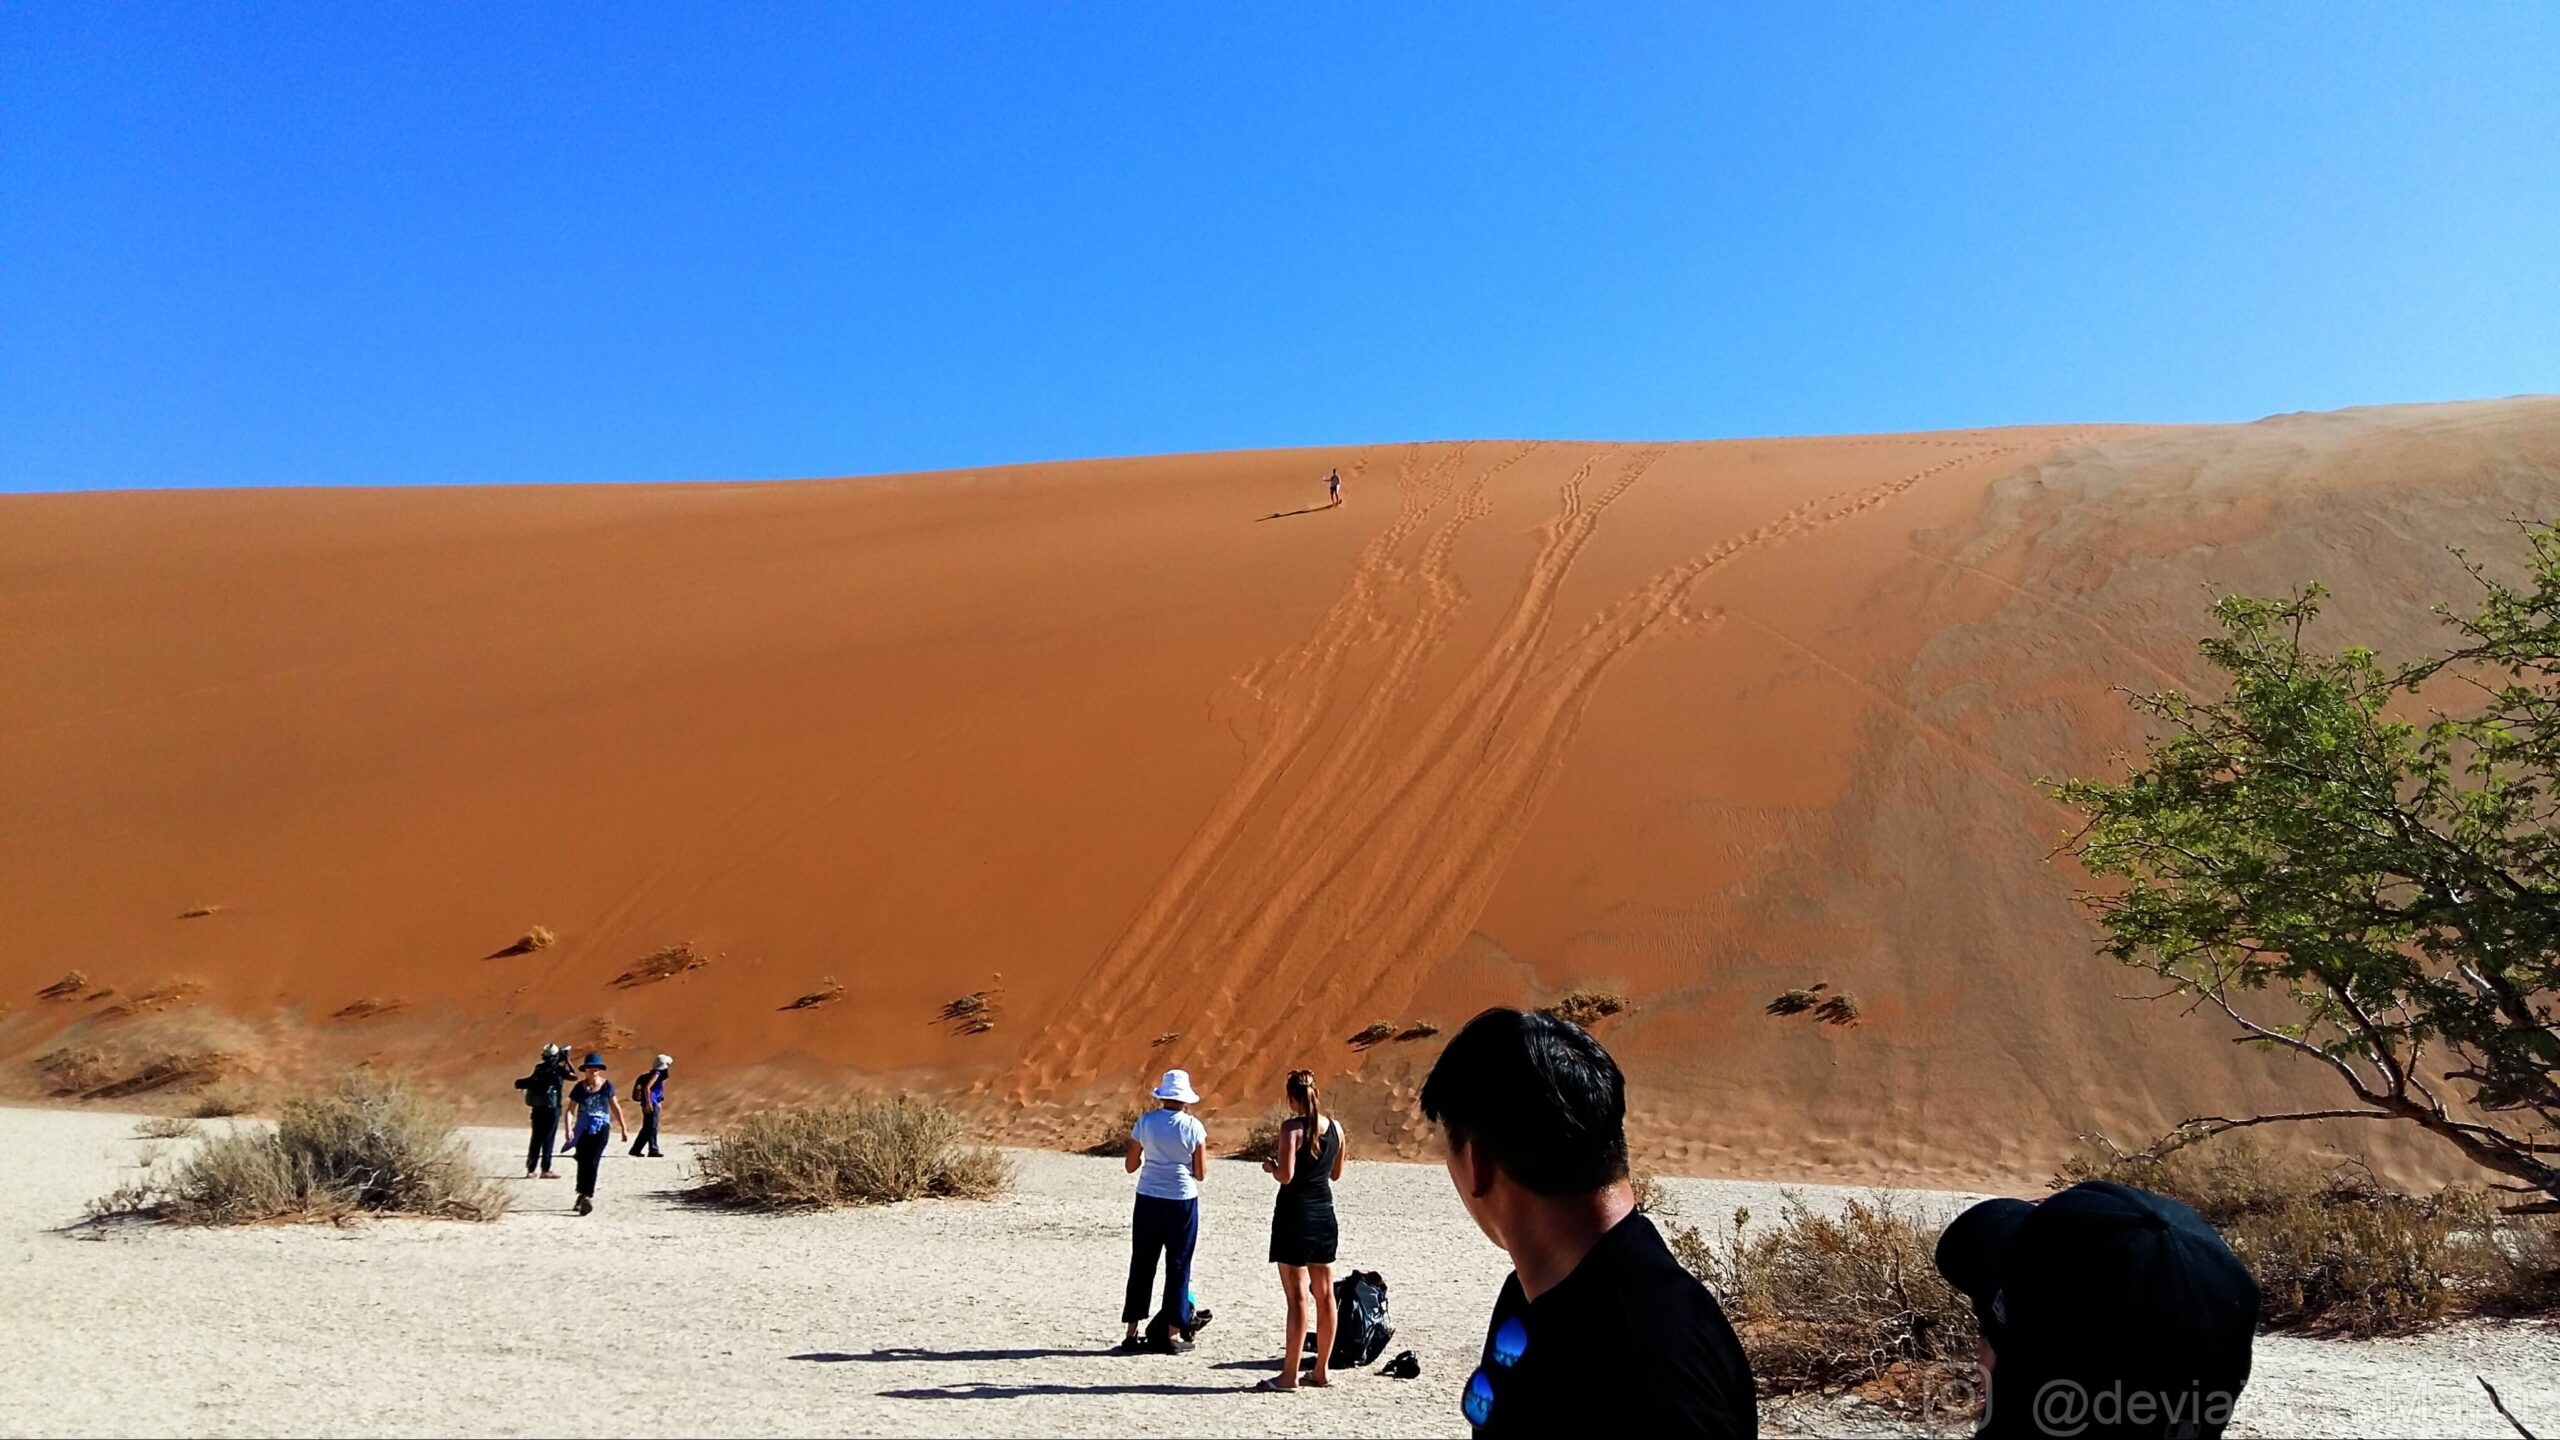 Bajando la duna